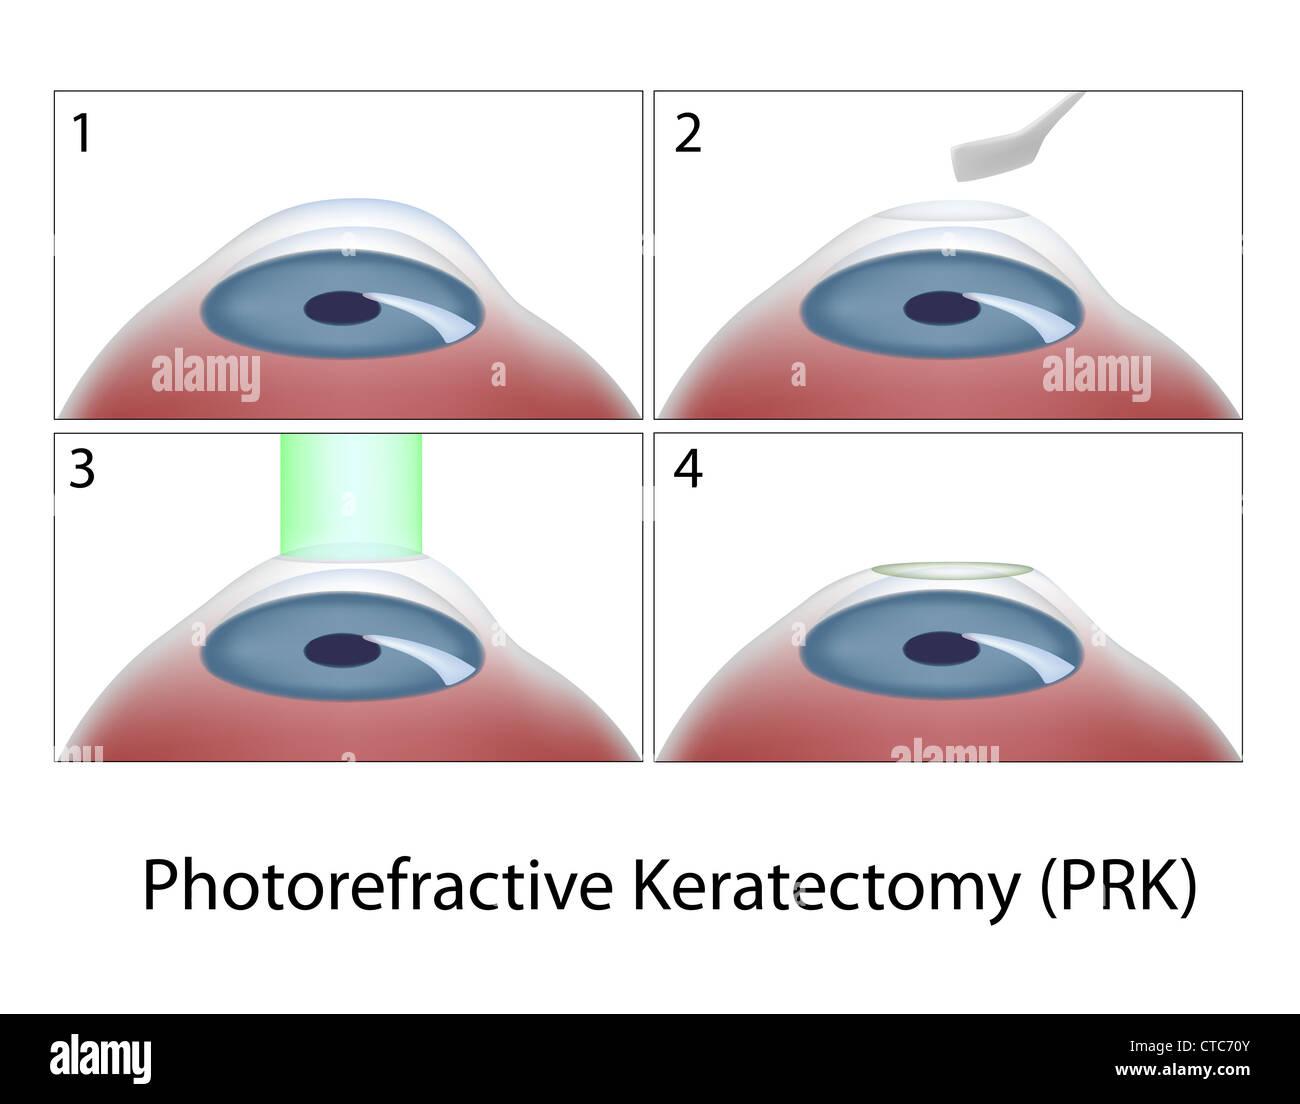 Photorefractive Keratectomy (PRK) surgery - Stock Image